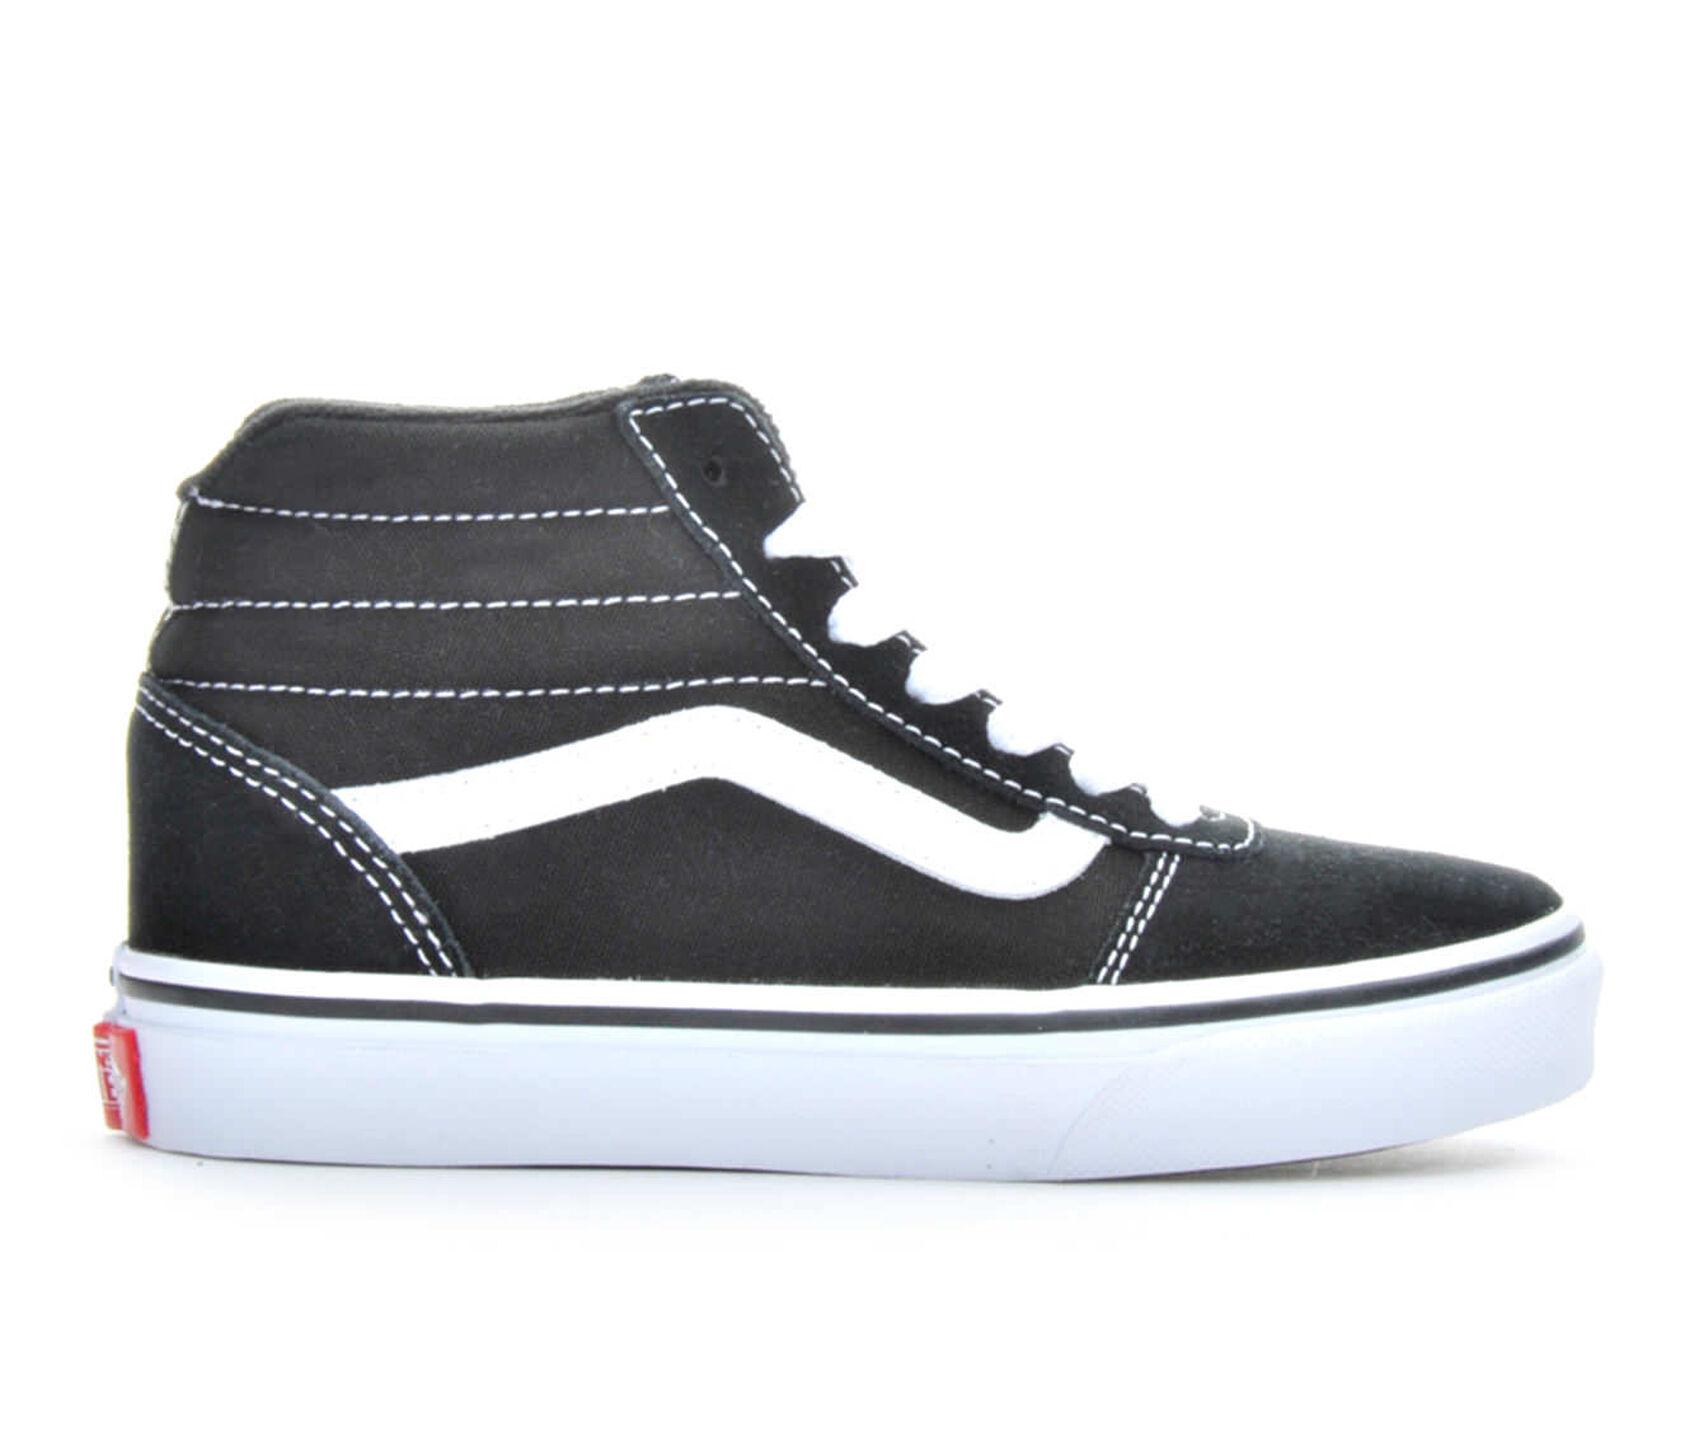 018d62e4b4 Kids  Vans Little Kid   Big Kid Ward Hi High Top Skate Shoes